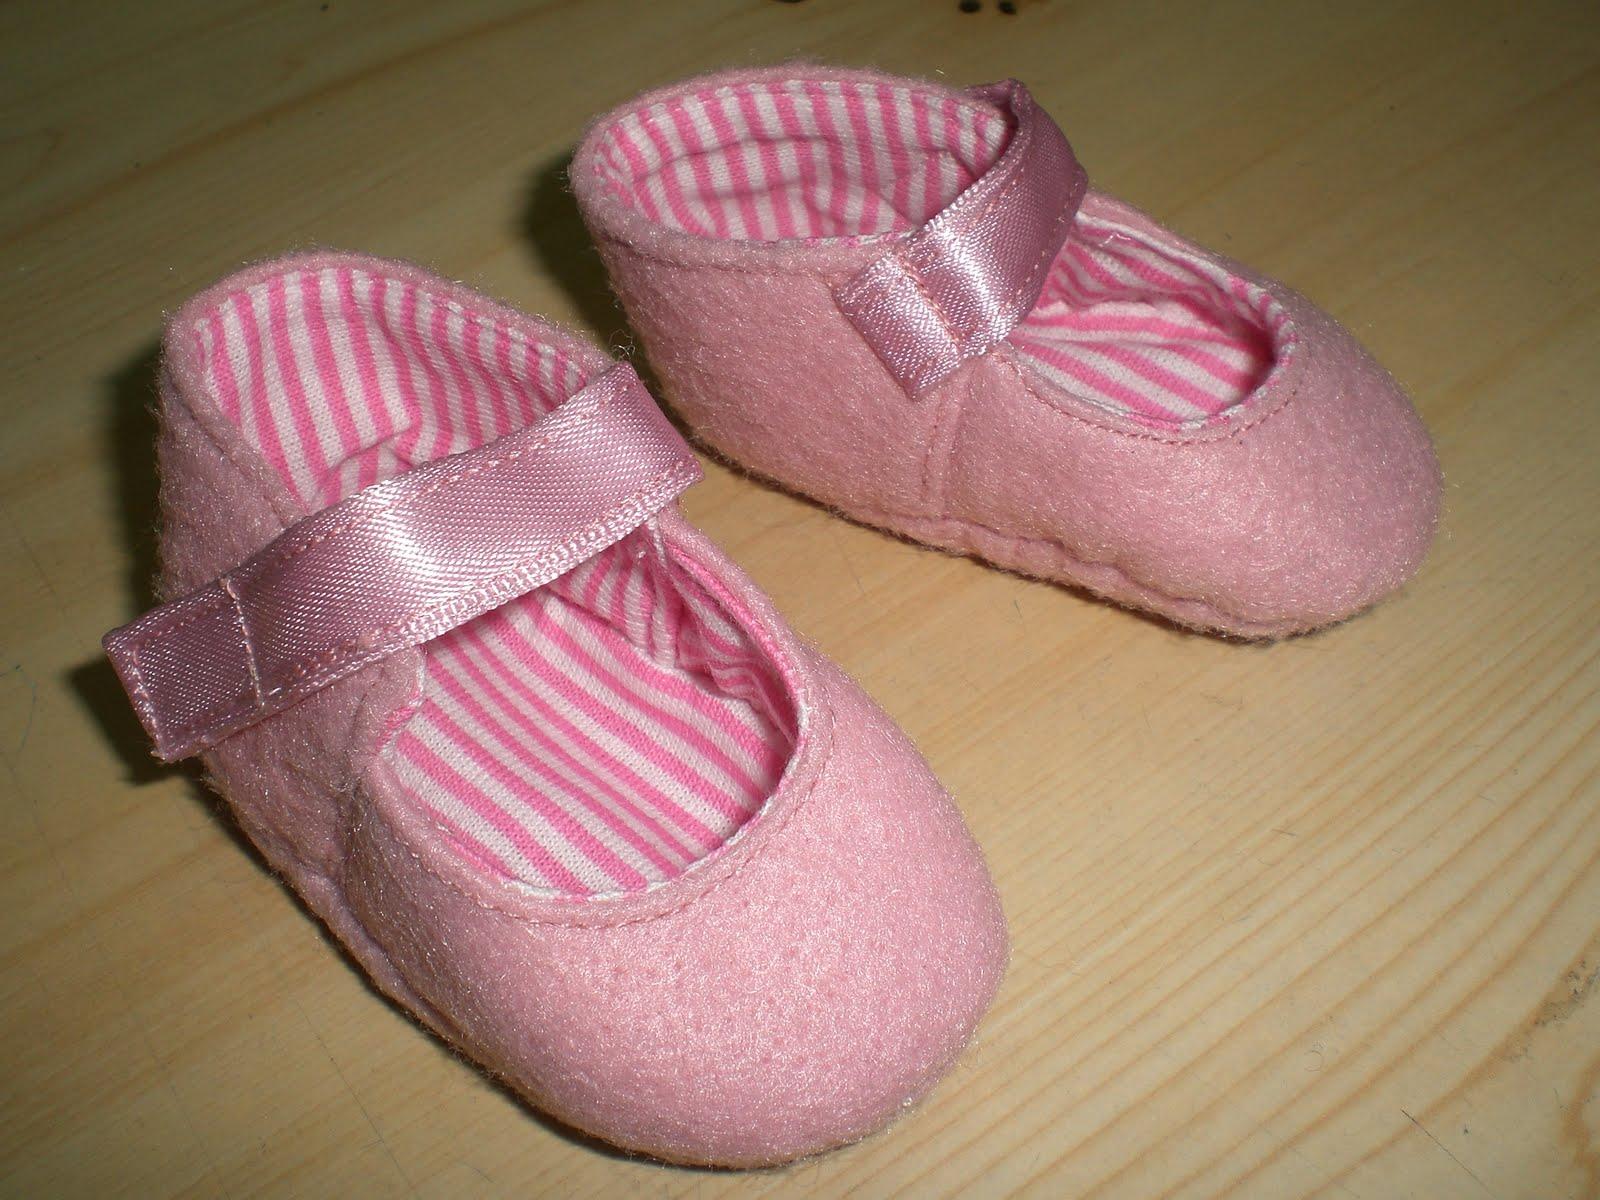 Liladas zapatos de tela para beb s - Zapateros de tela ...